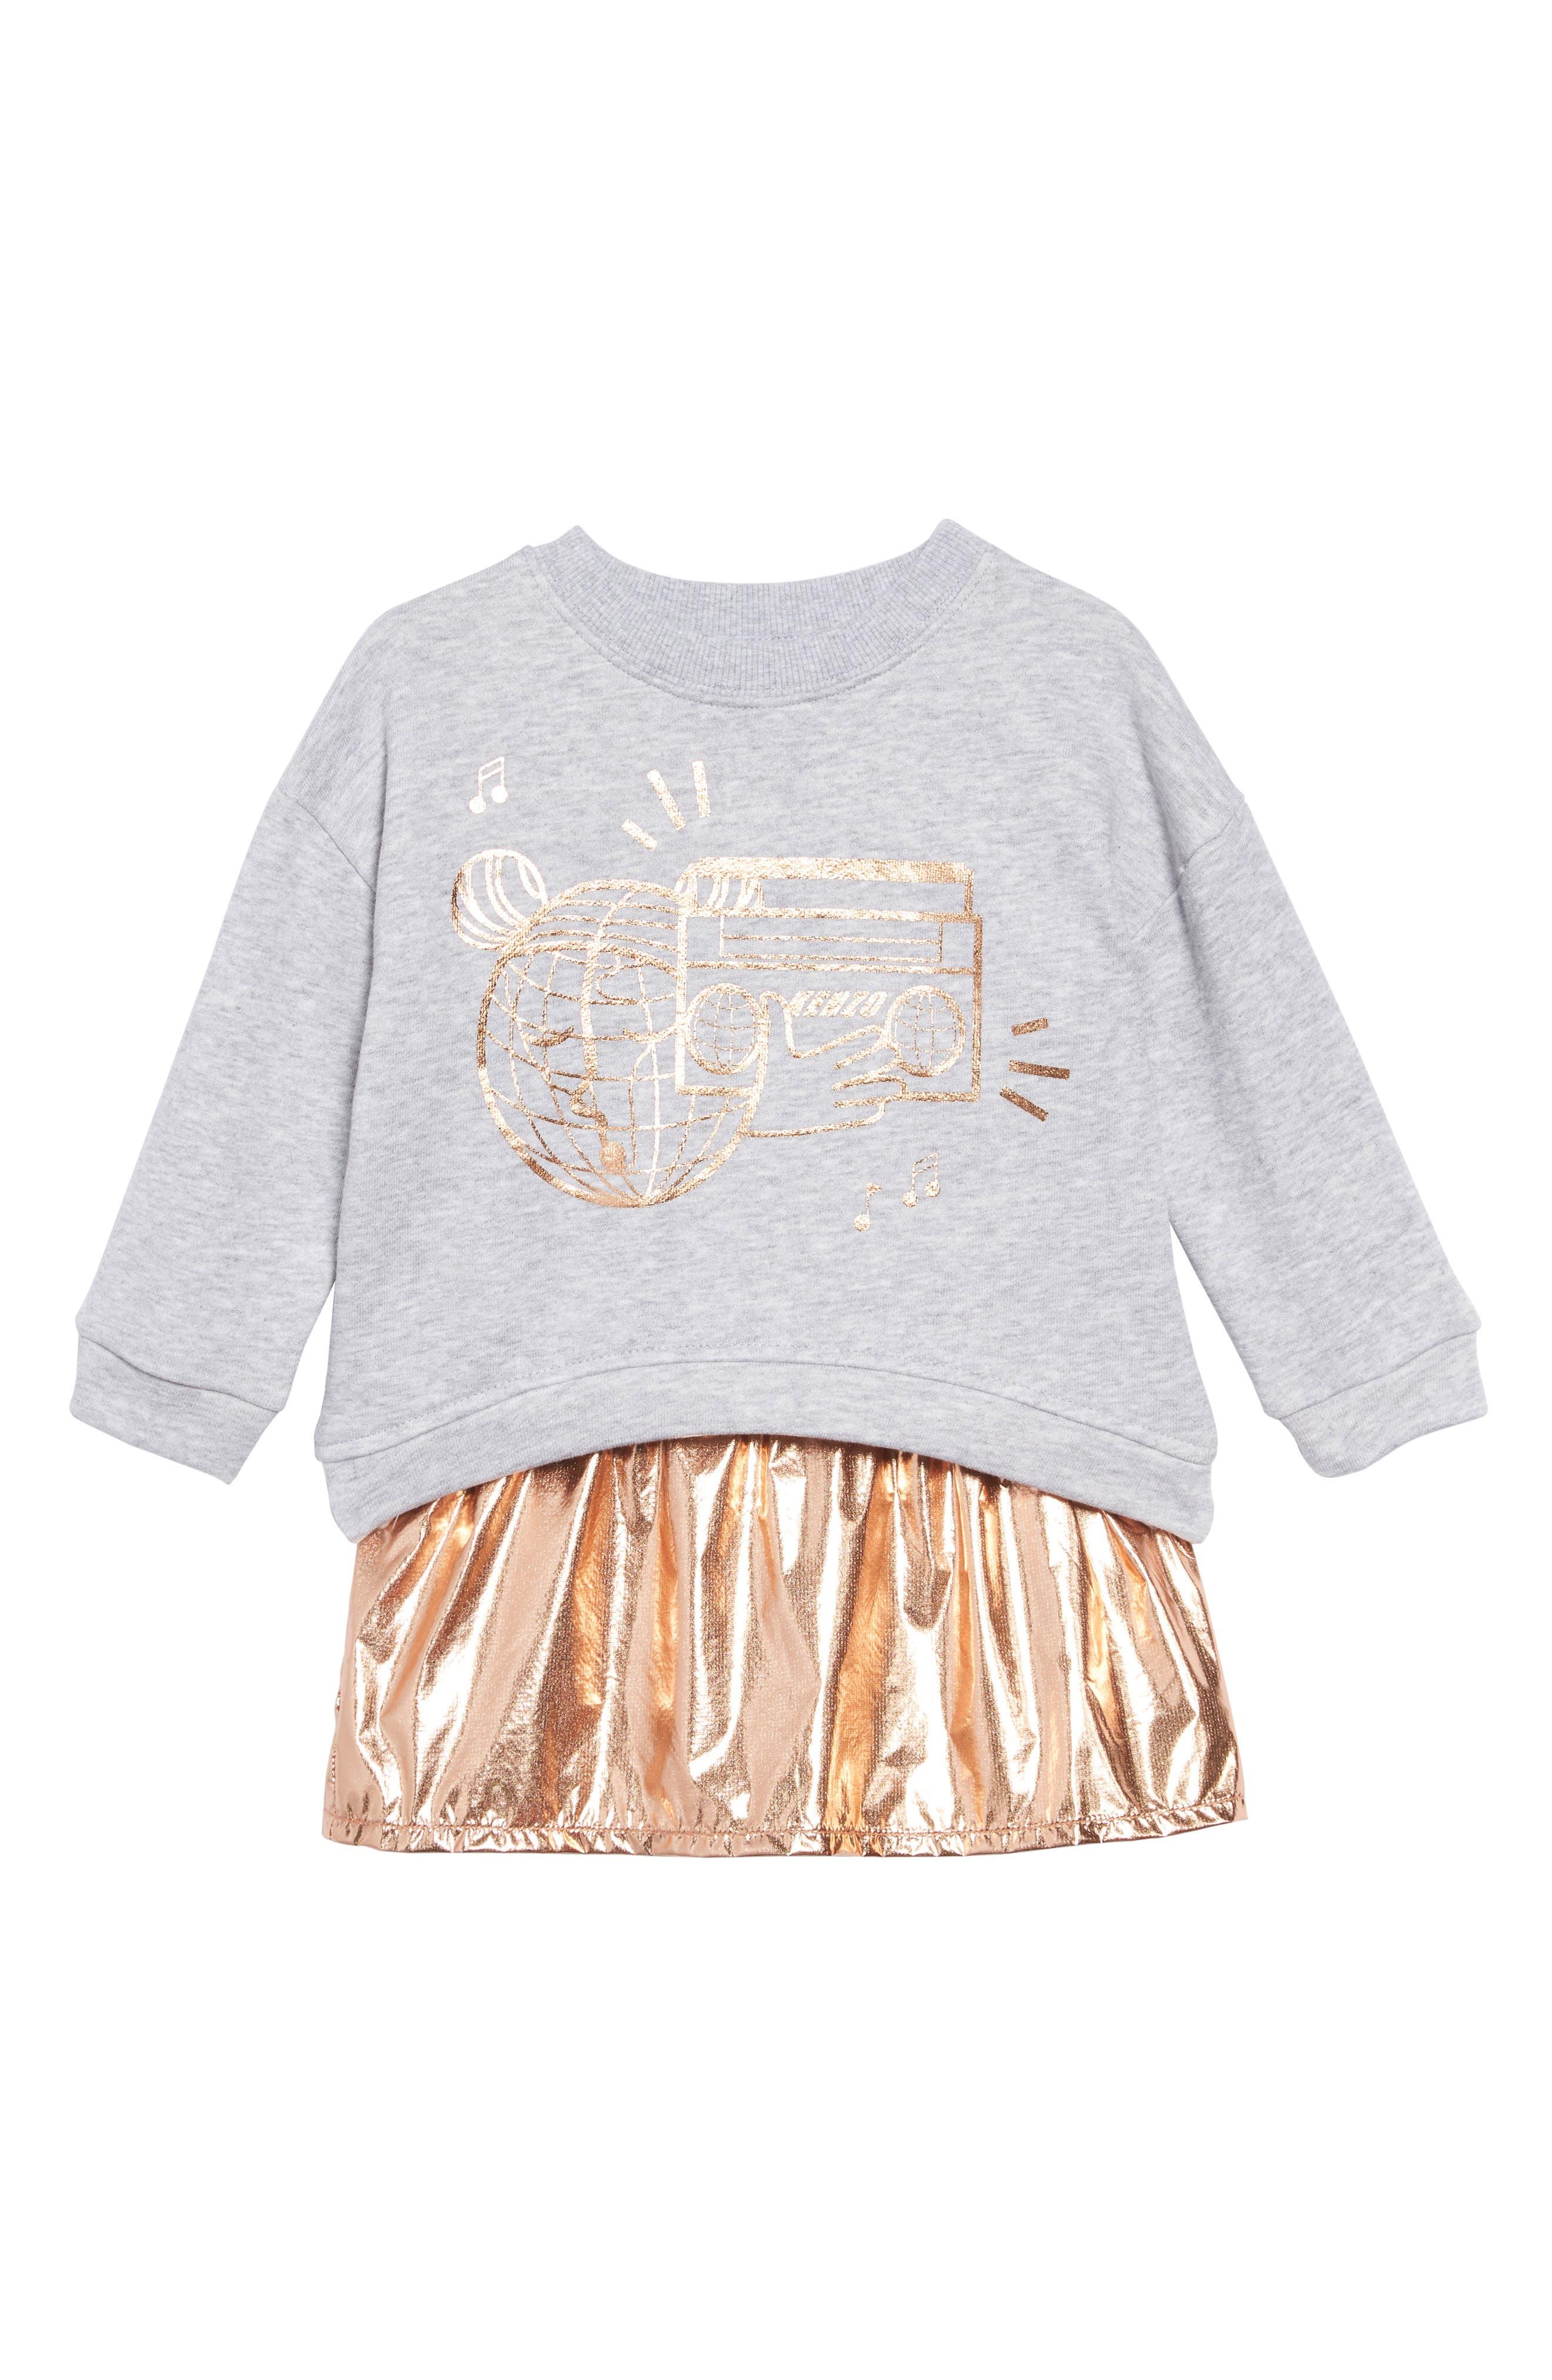 KENZO Metallic Graphic Sweatshirt & Dress Set, Main, color, COPPER